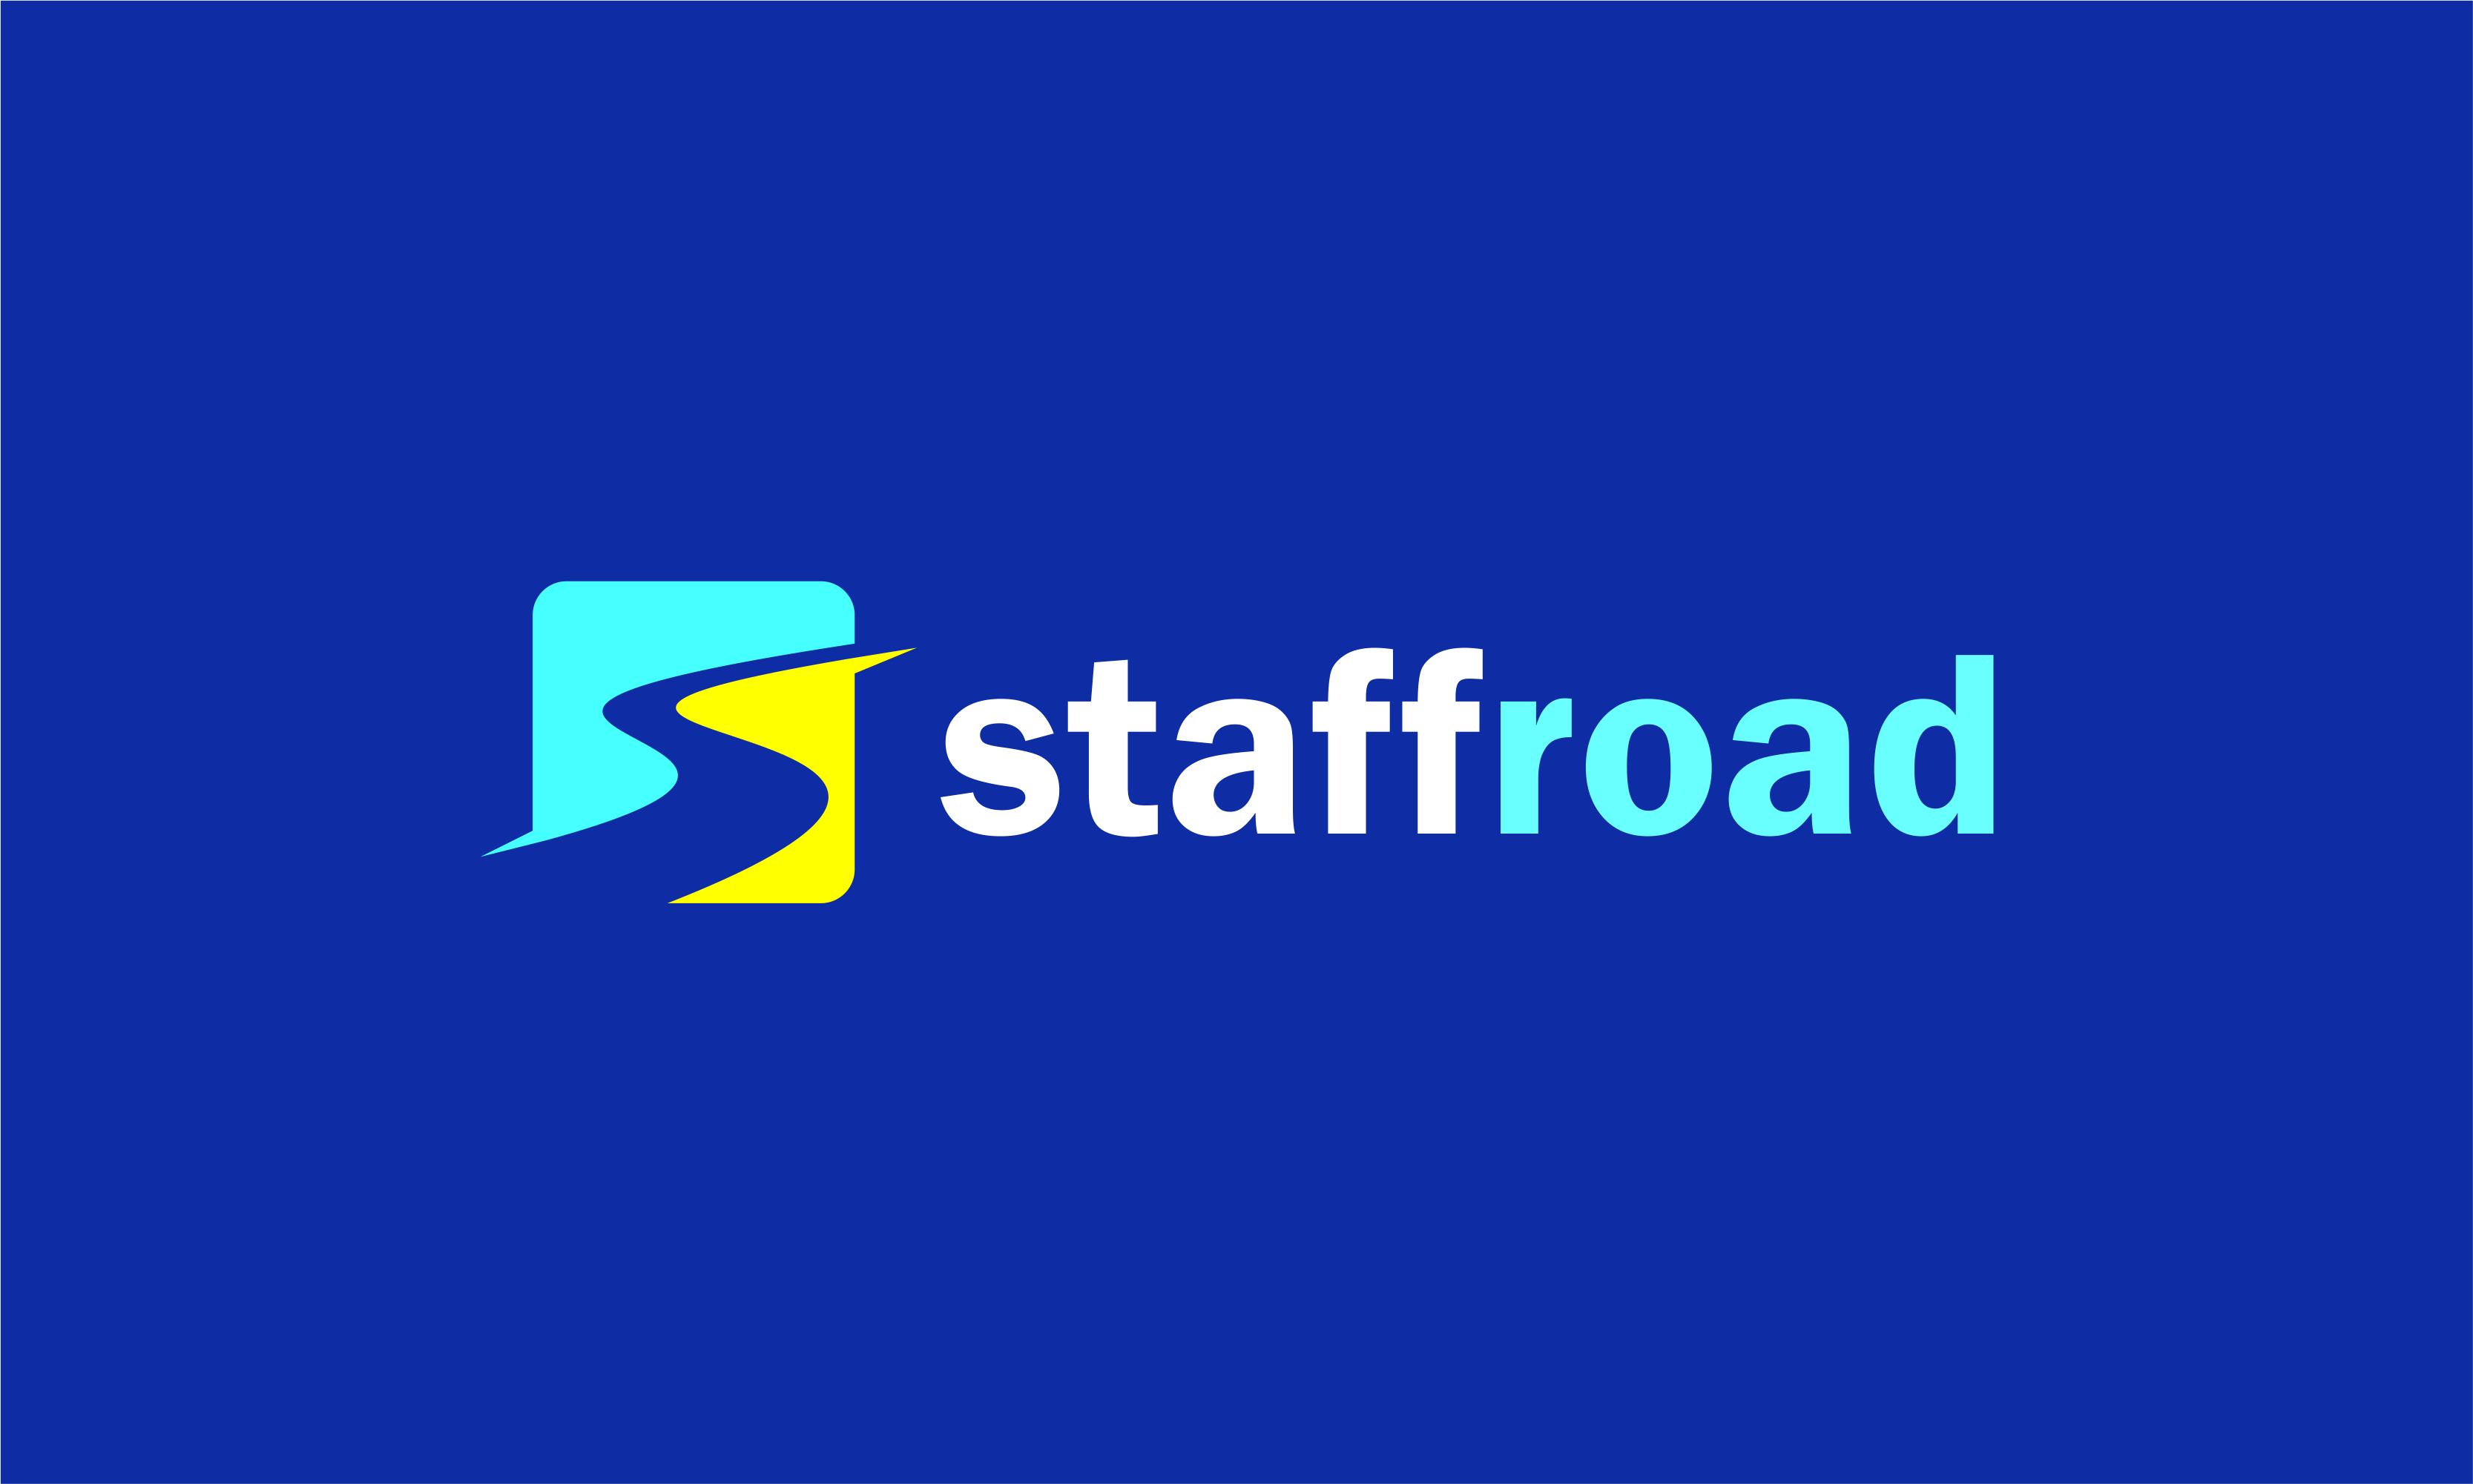 staffroad logo